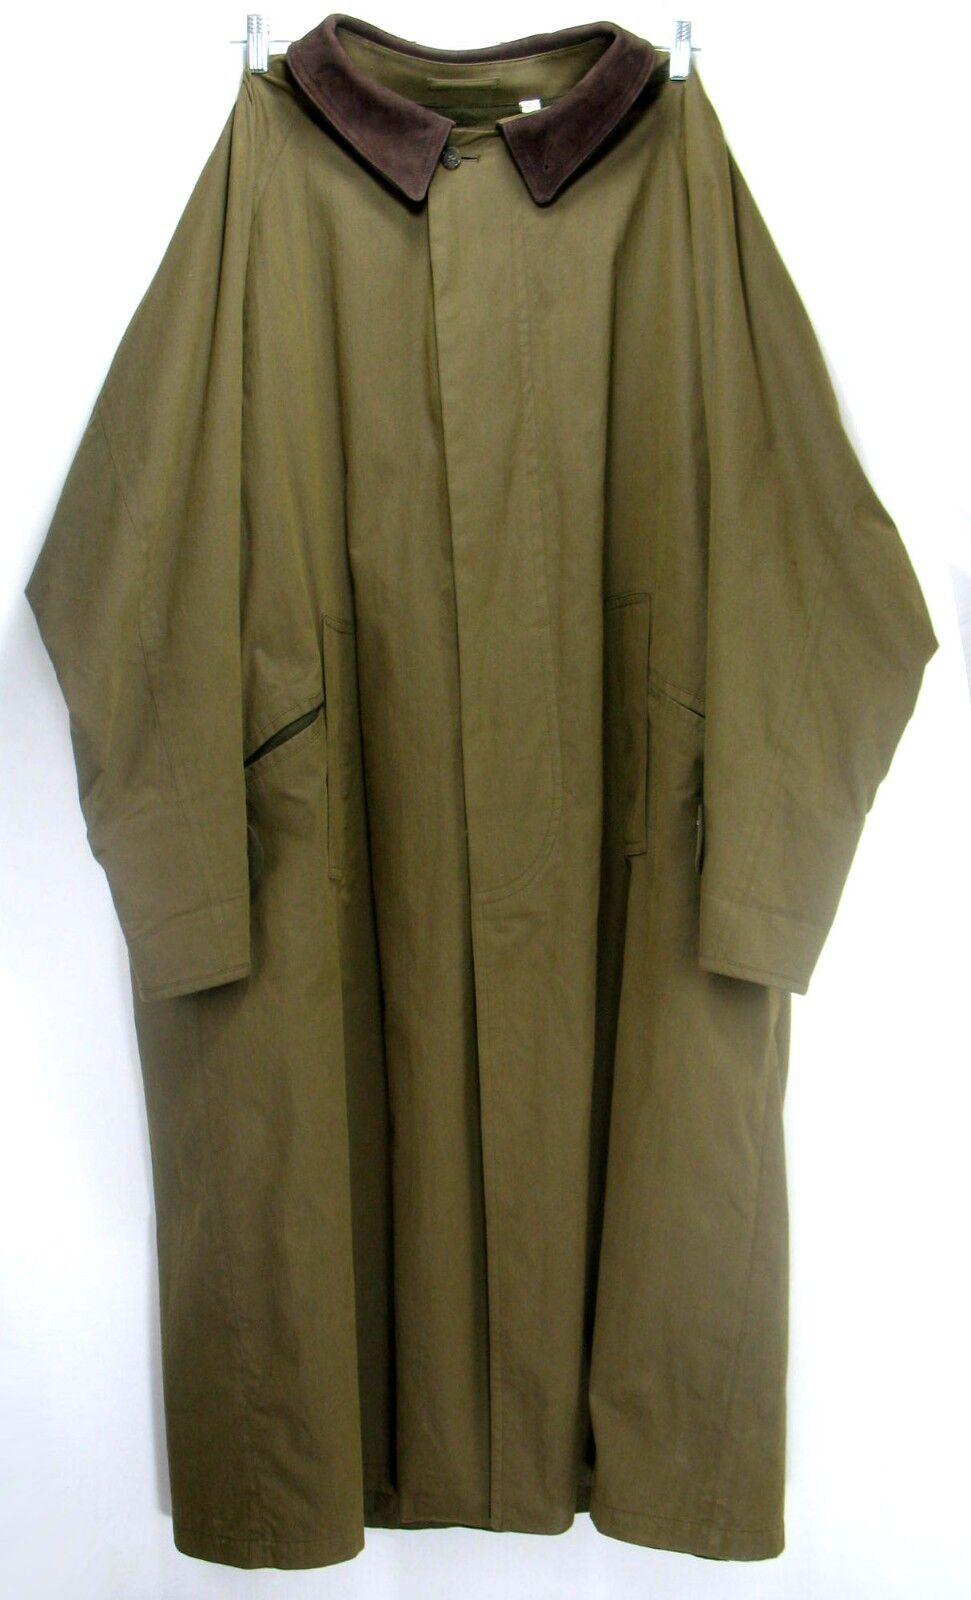 London Fog - Trench Coat - Removable Liner - Hidden Buttons - Men's Size 44 Reg